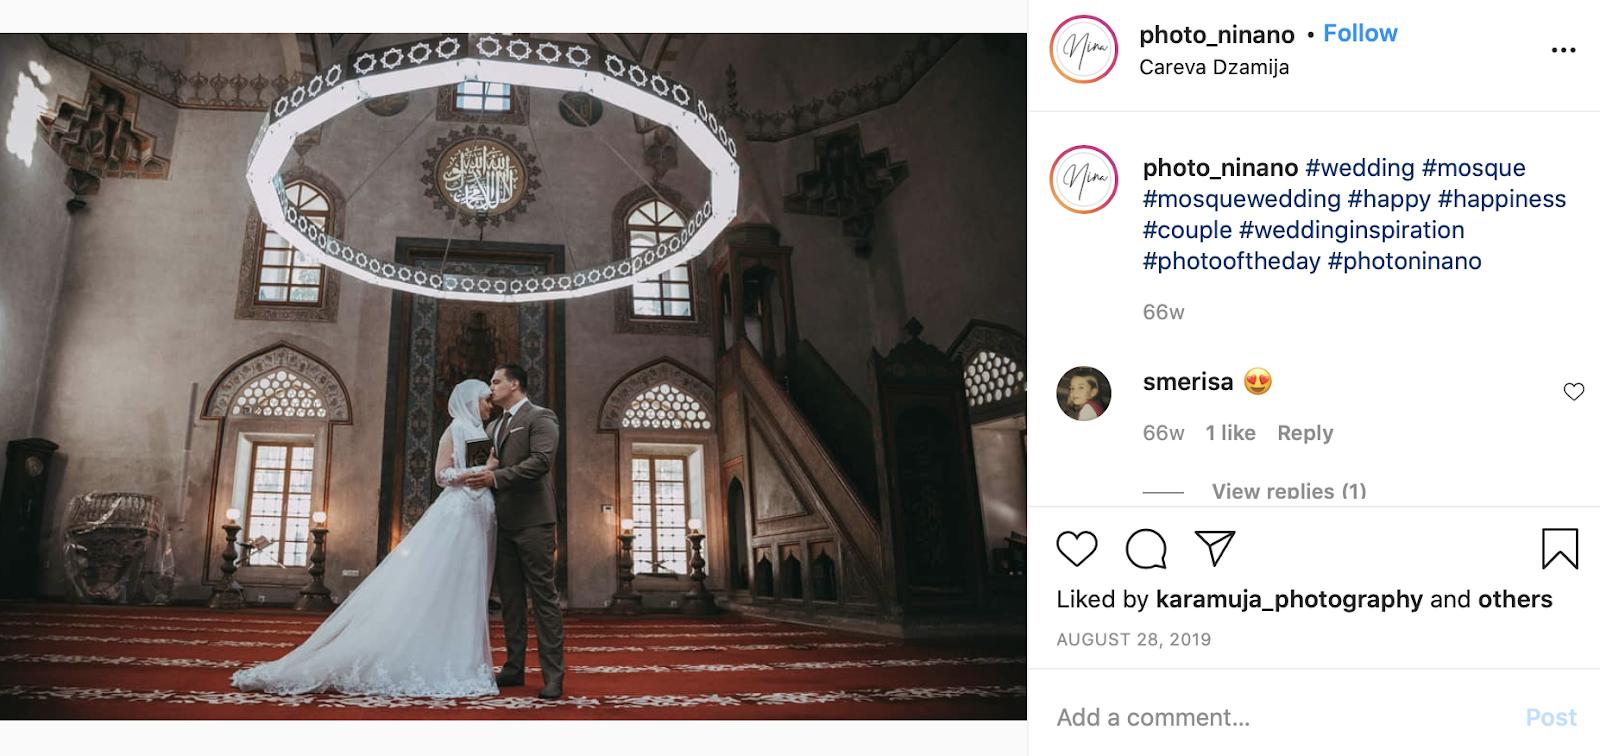 dress code at an Islamic wedding